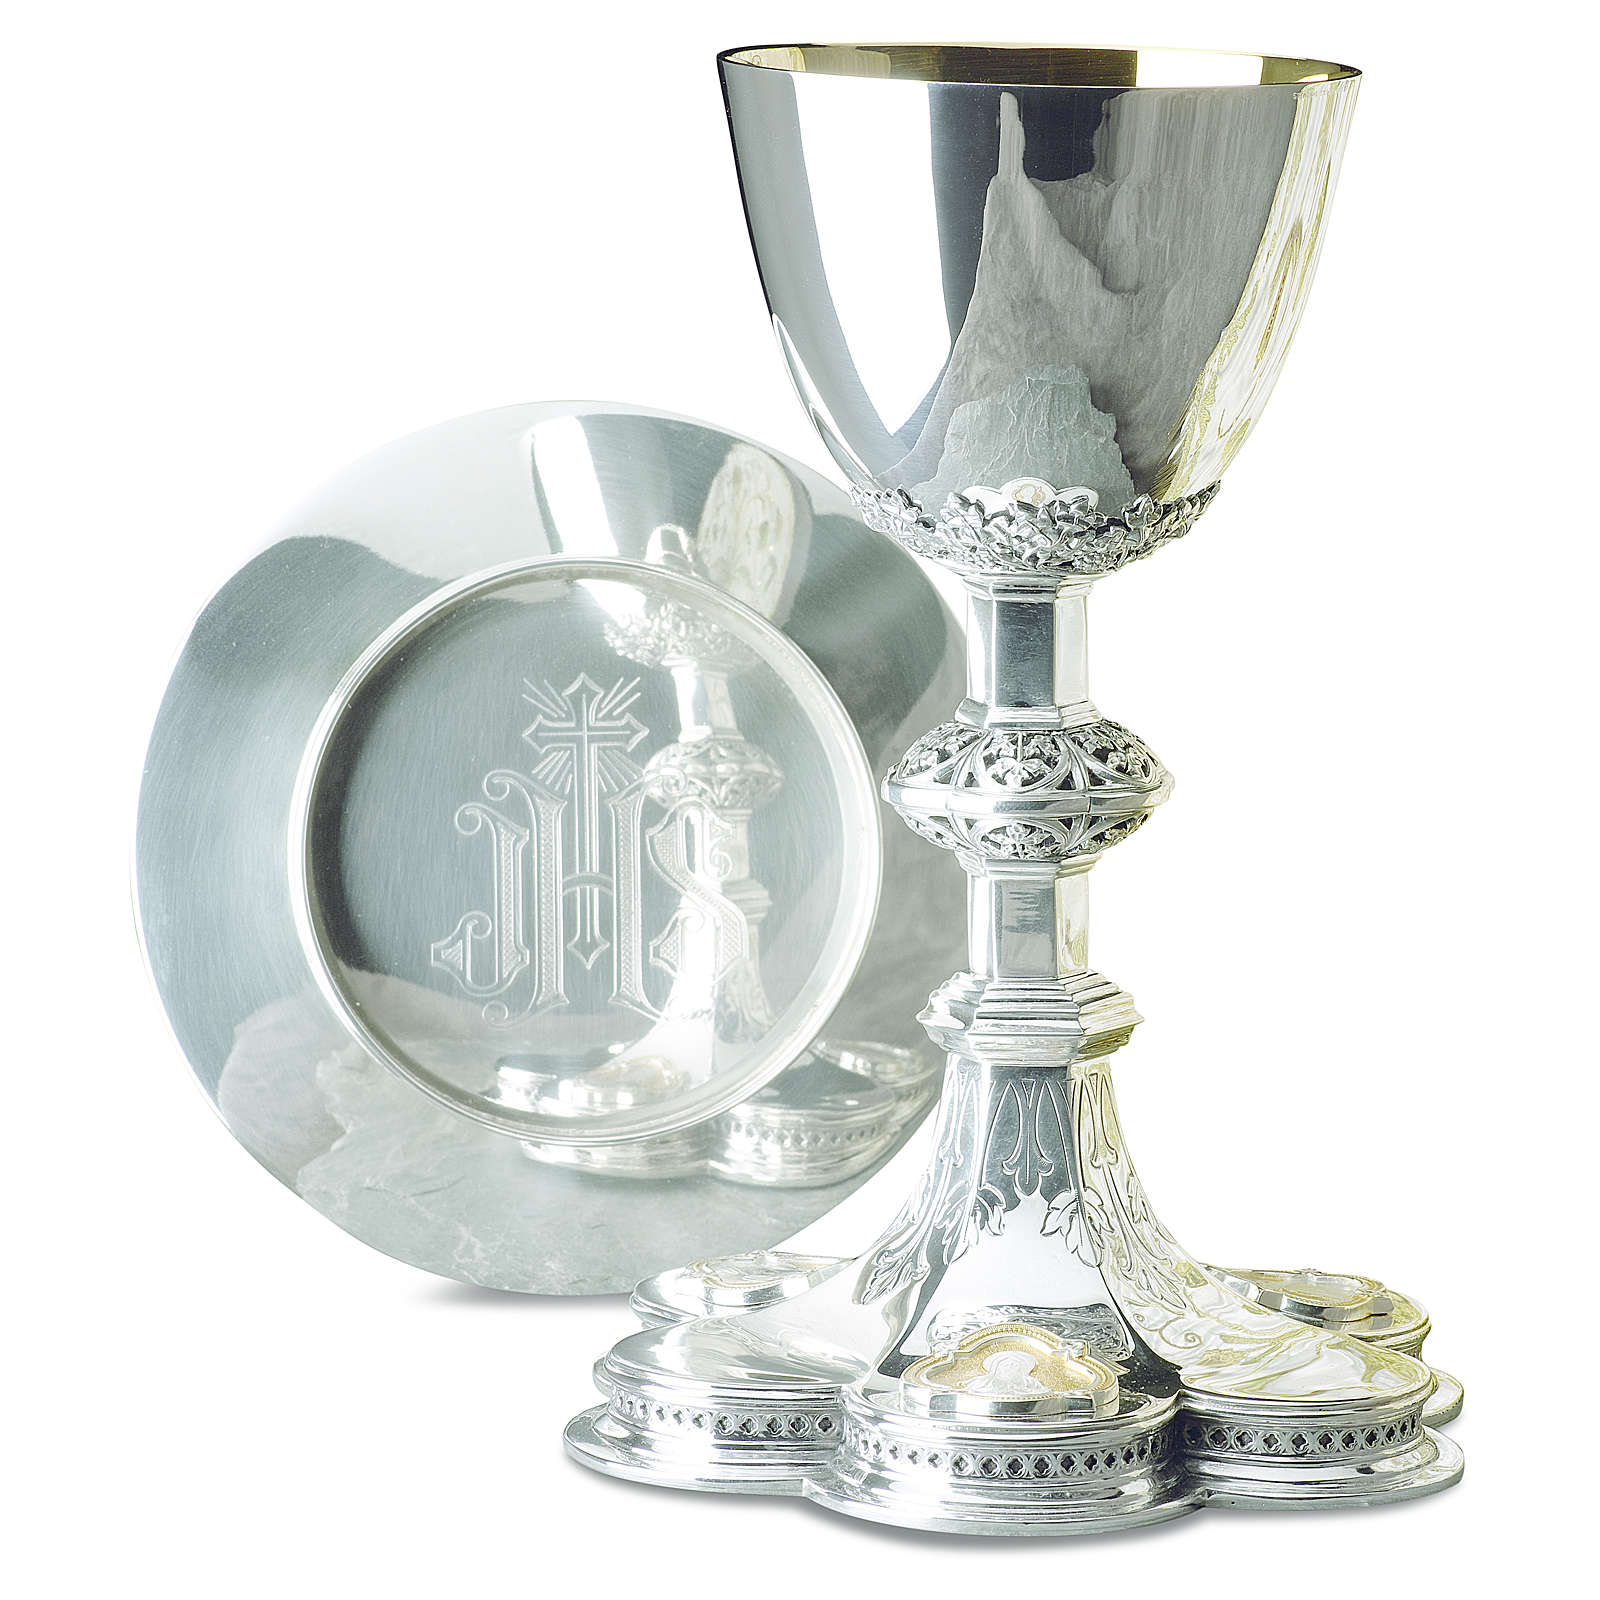 Calice patena Molina Gesù Maria Giuseppe argento 925 4